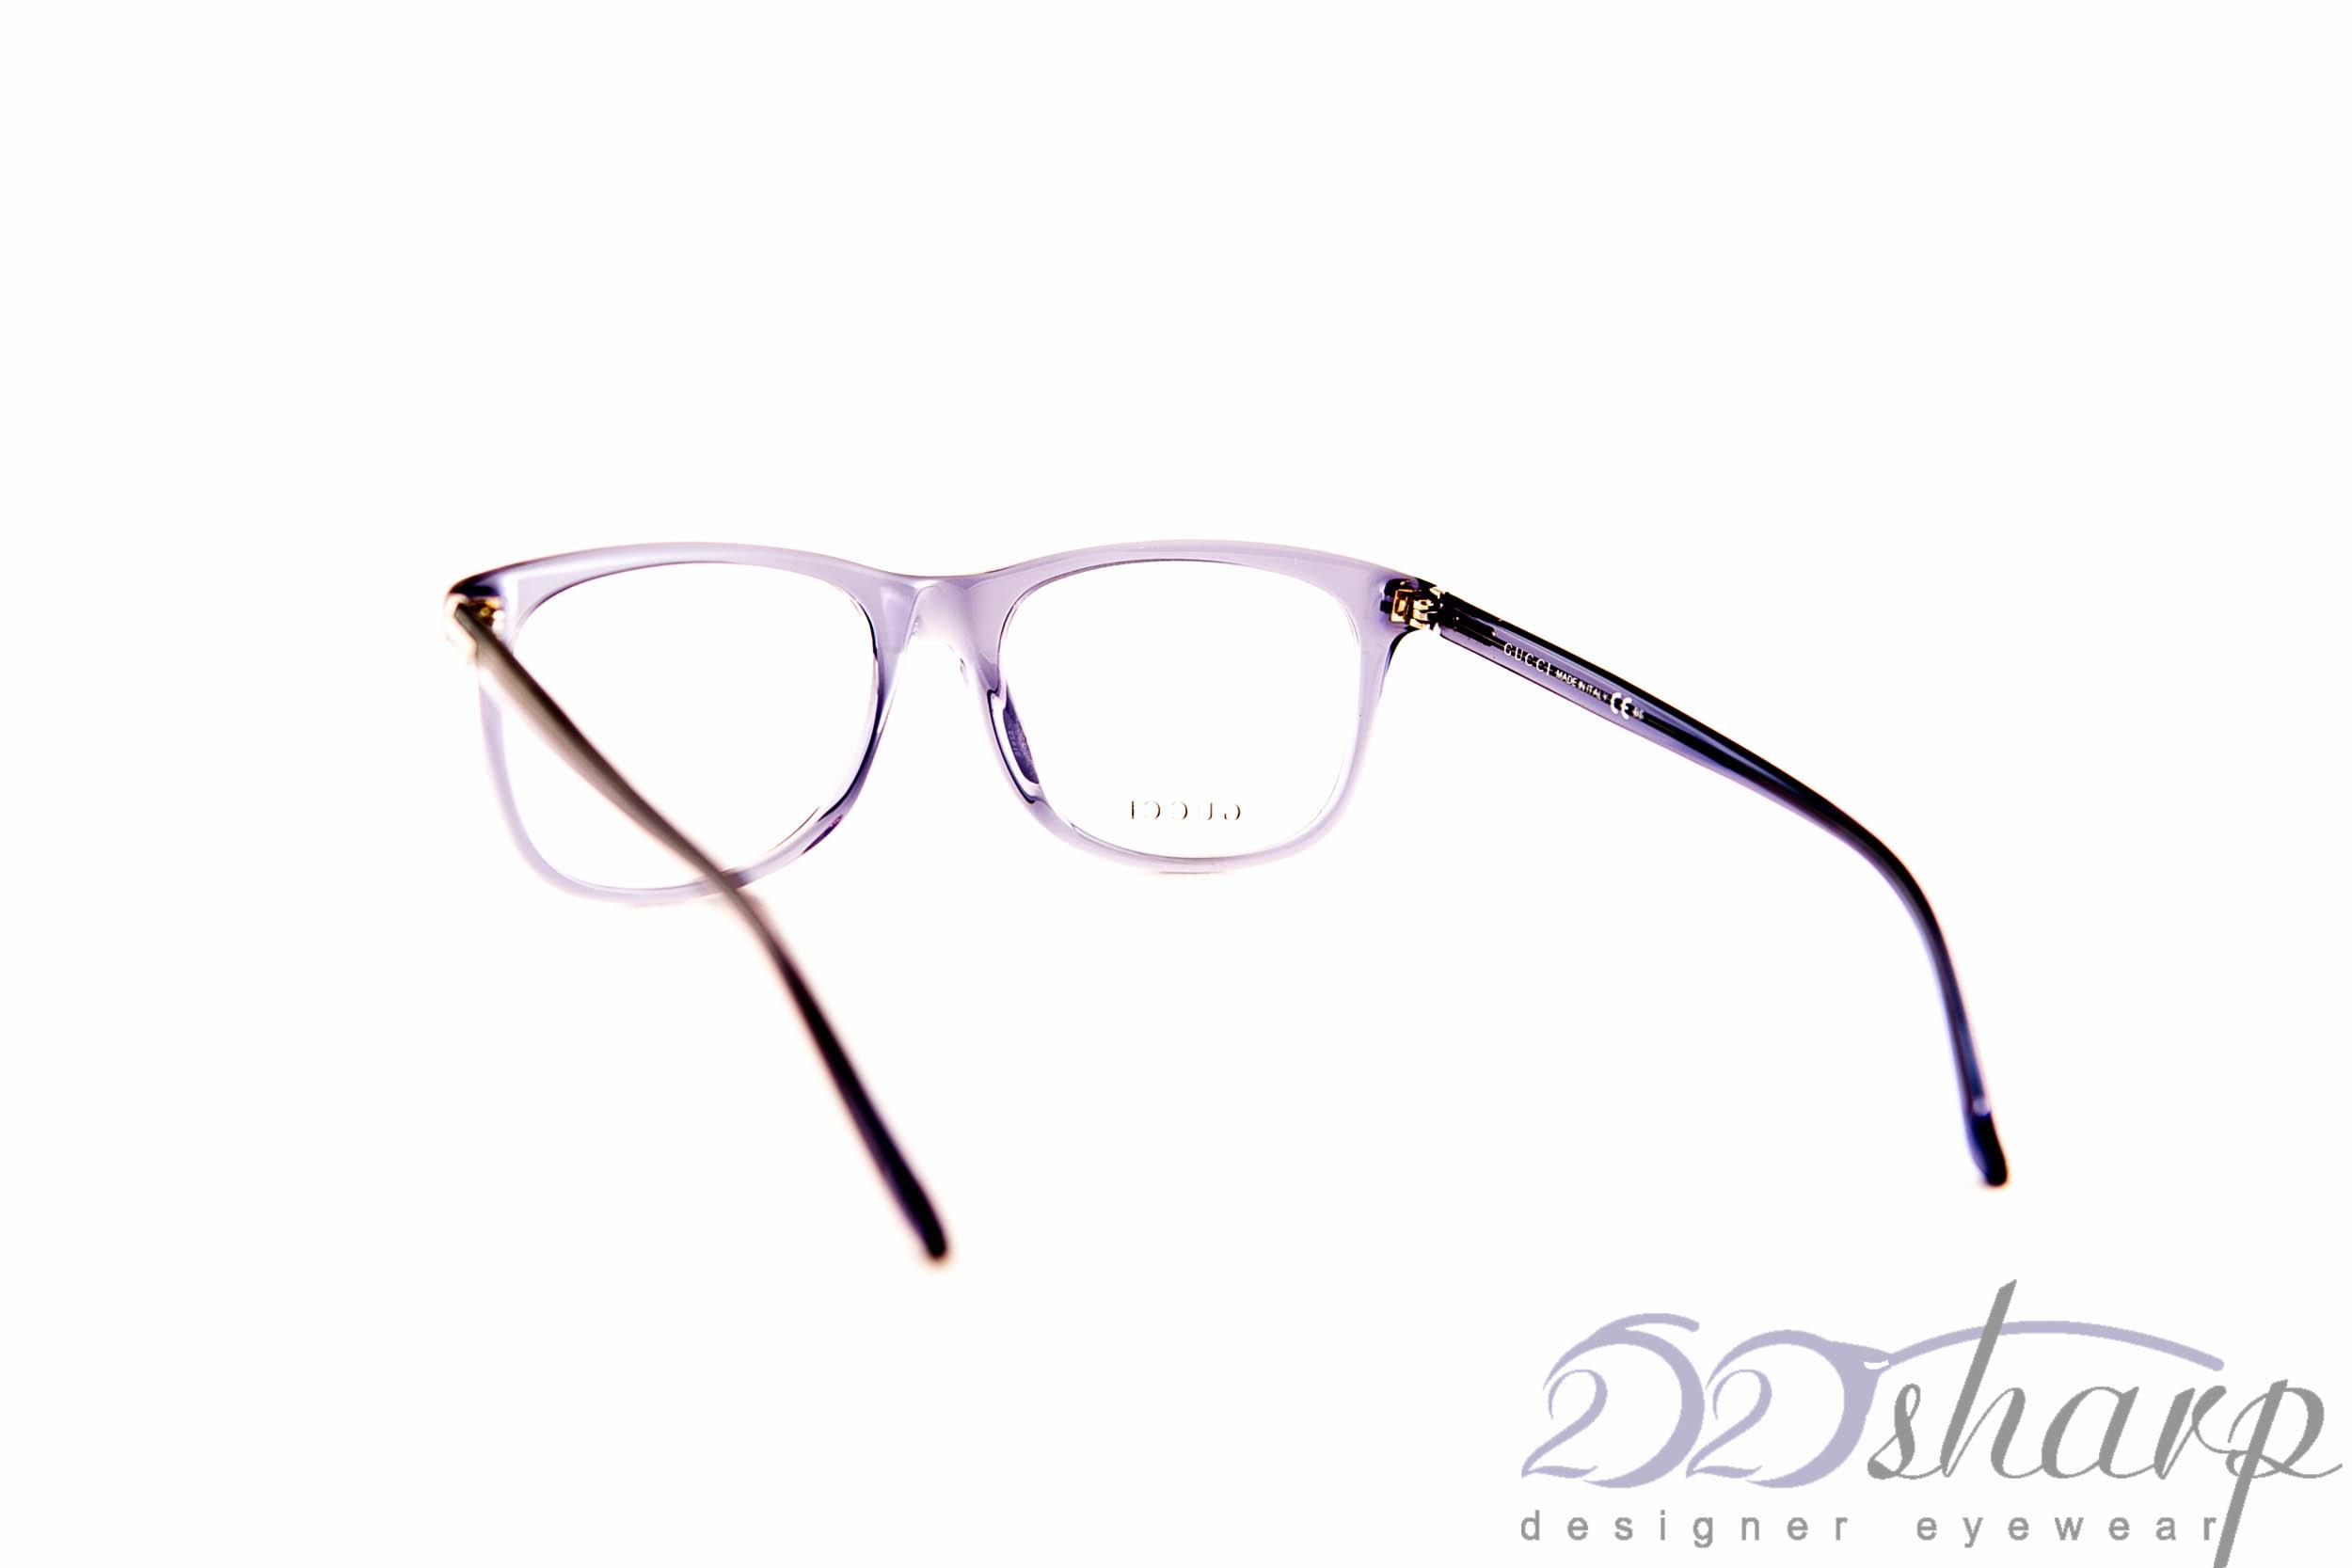 Big Blue Glasses Frames : Gucci Eyeglasses-GG 1037 GLI Blue eBay